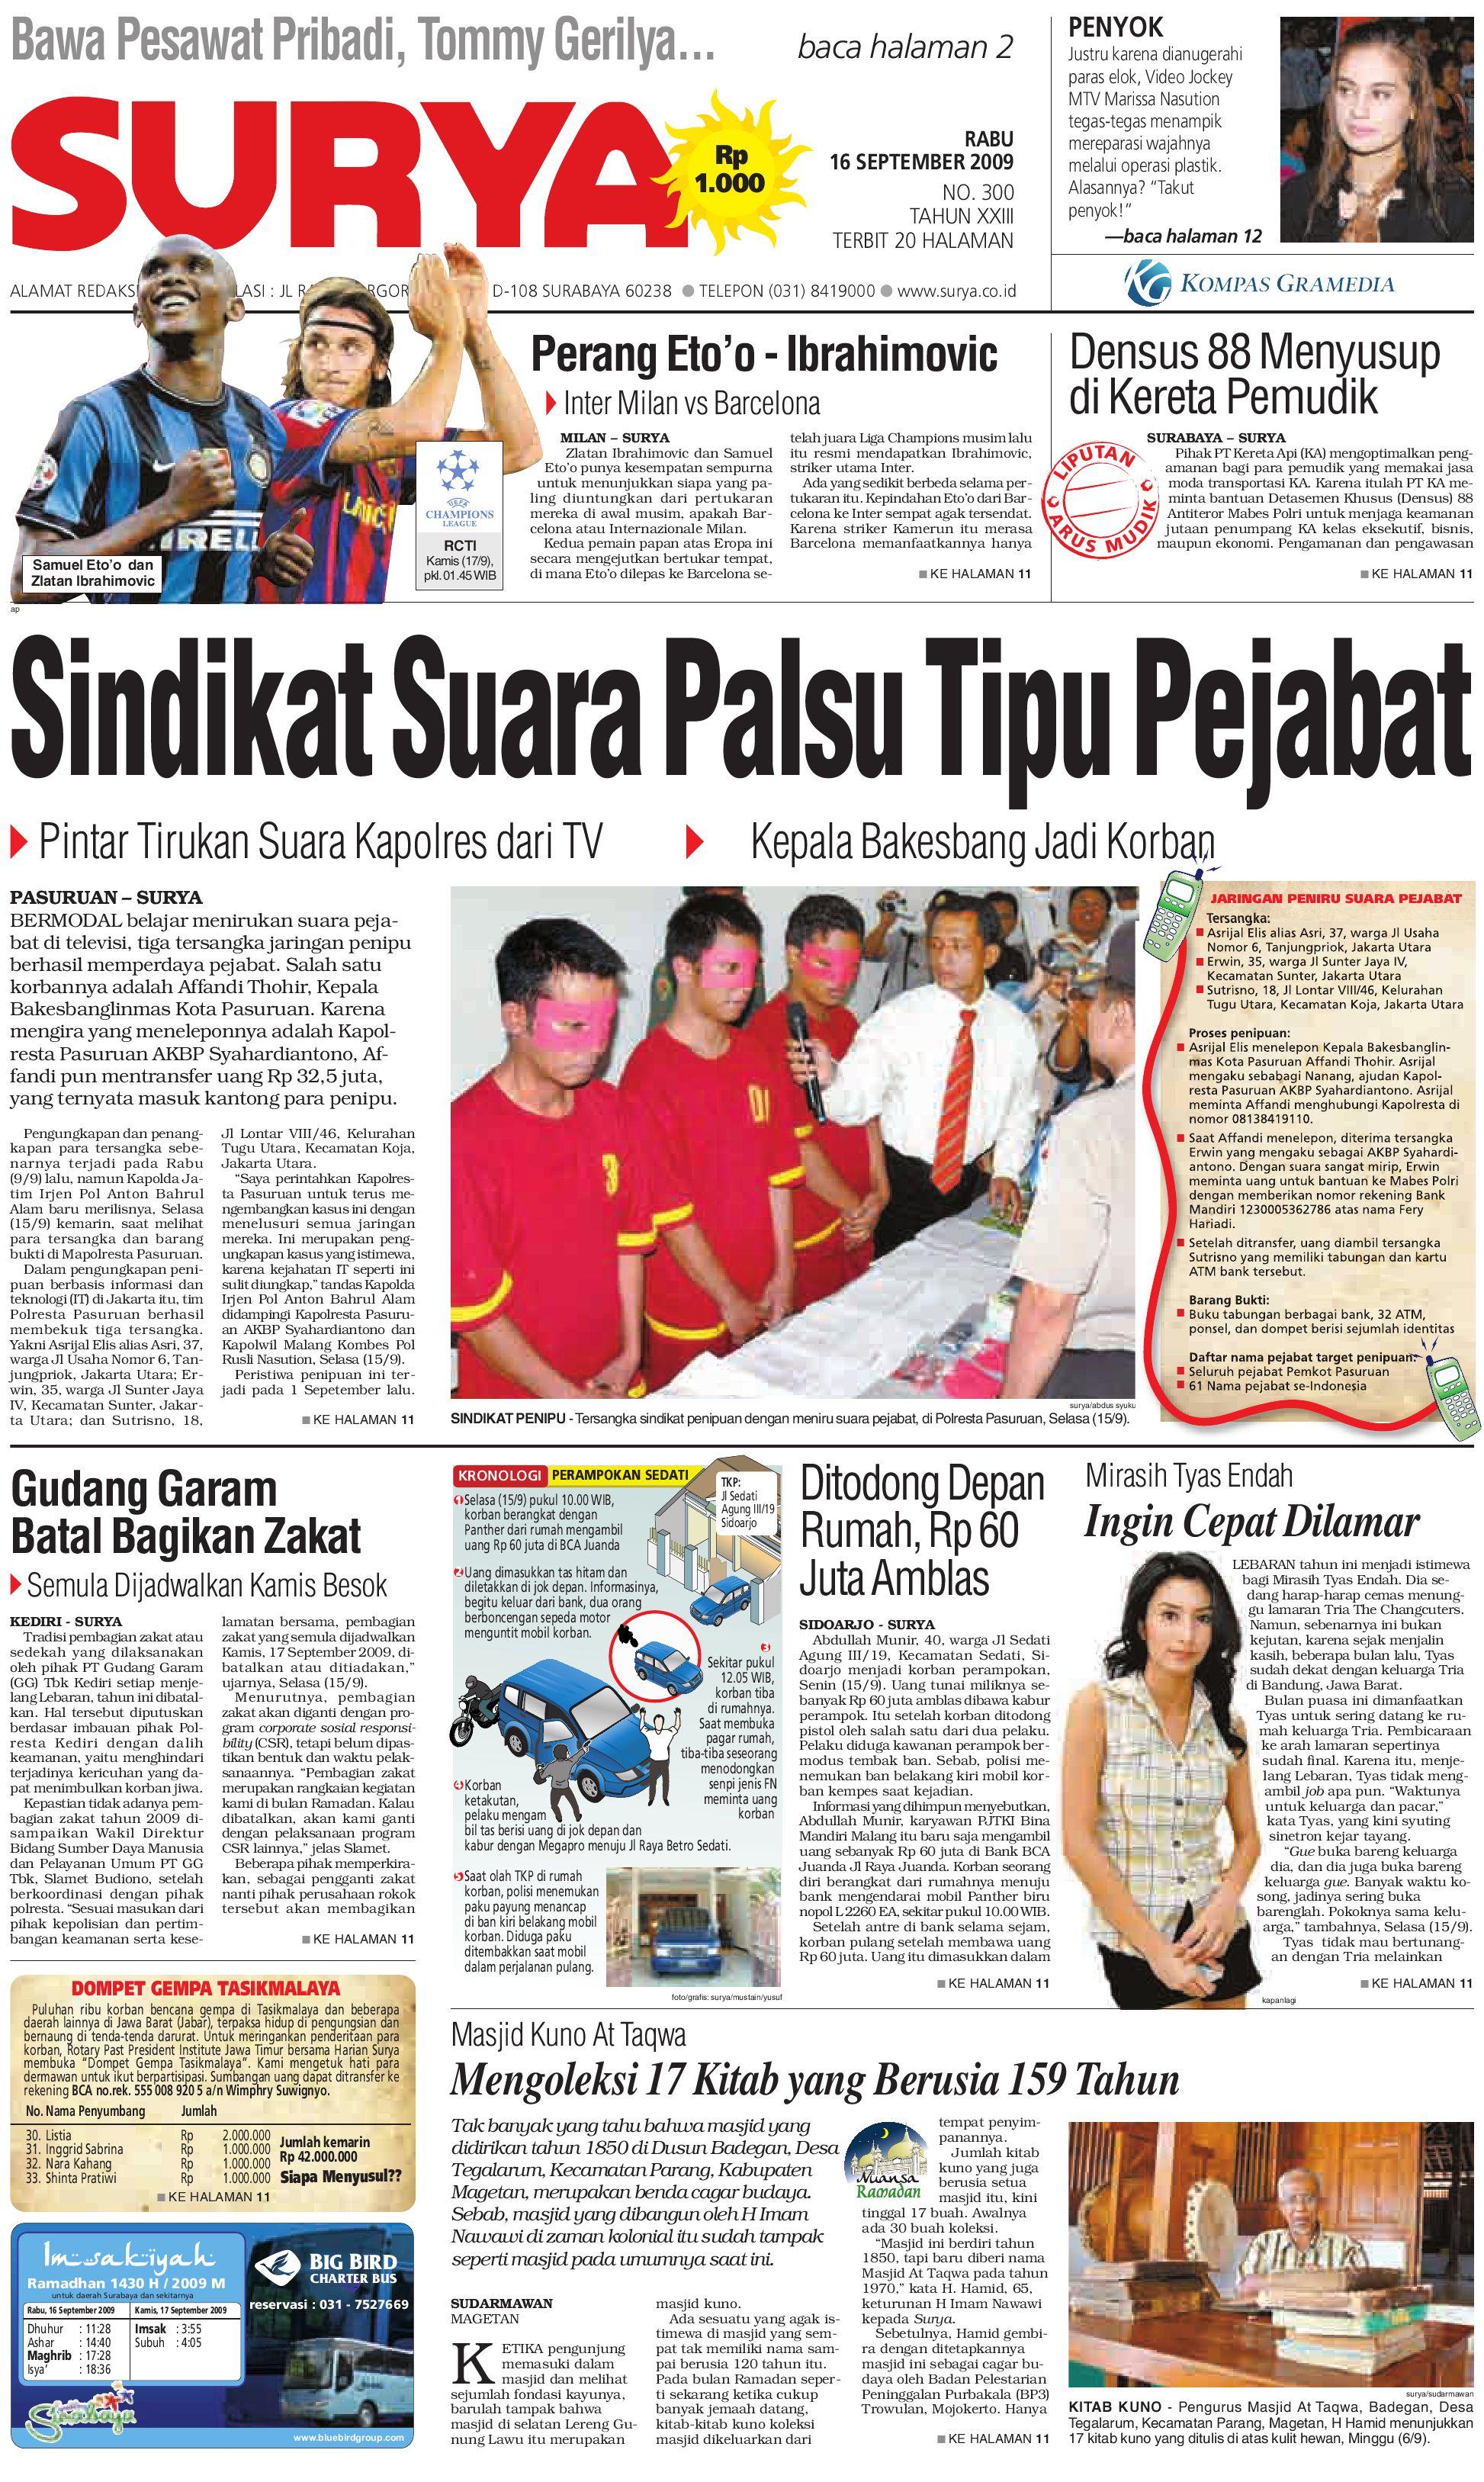 surya edisi cetak 31 juli 2009 by harian surya issuu